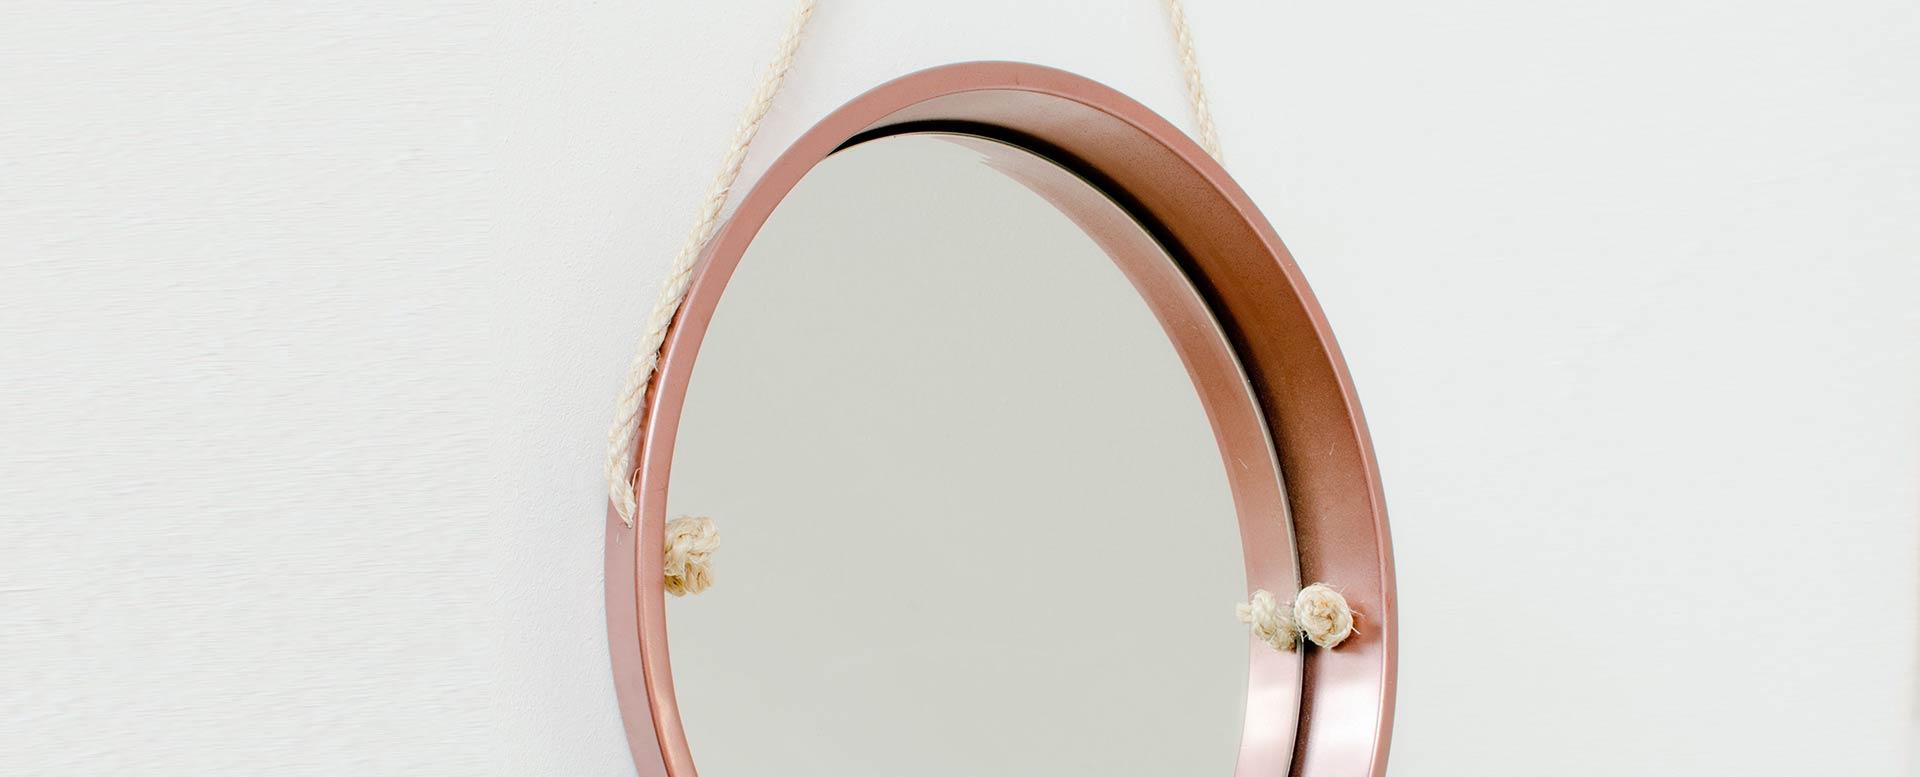 Upccyling - Spiegel aus Tablett